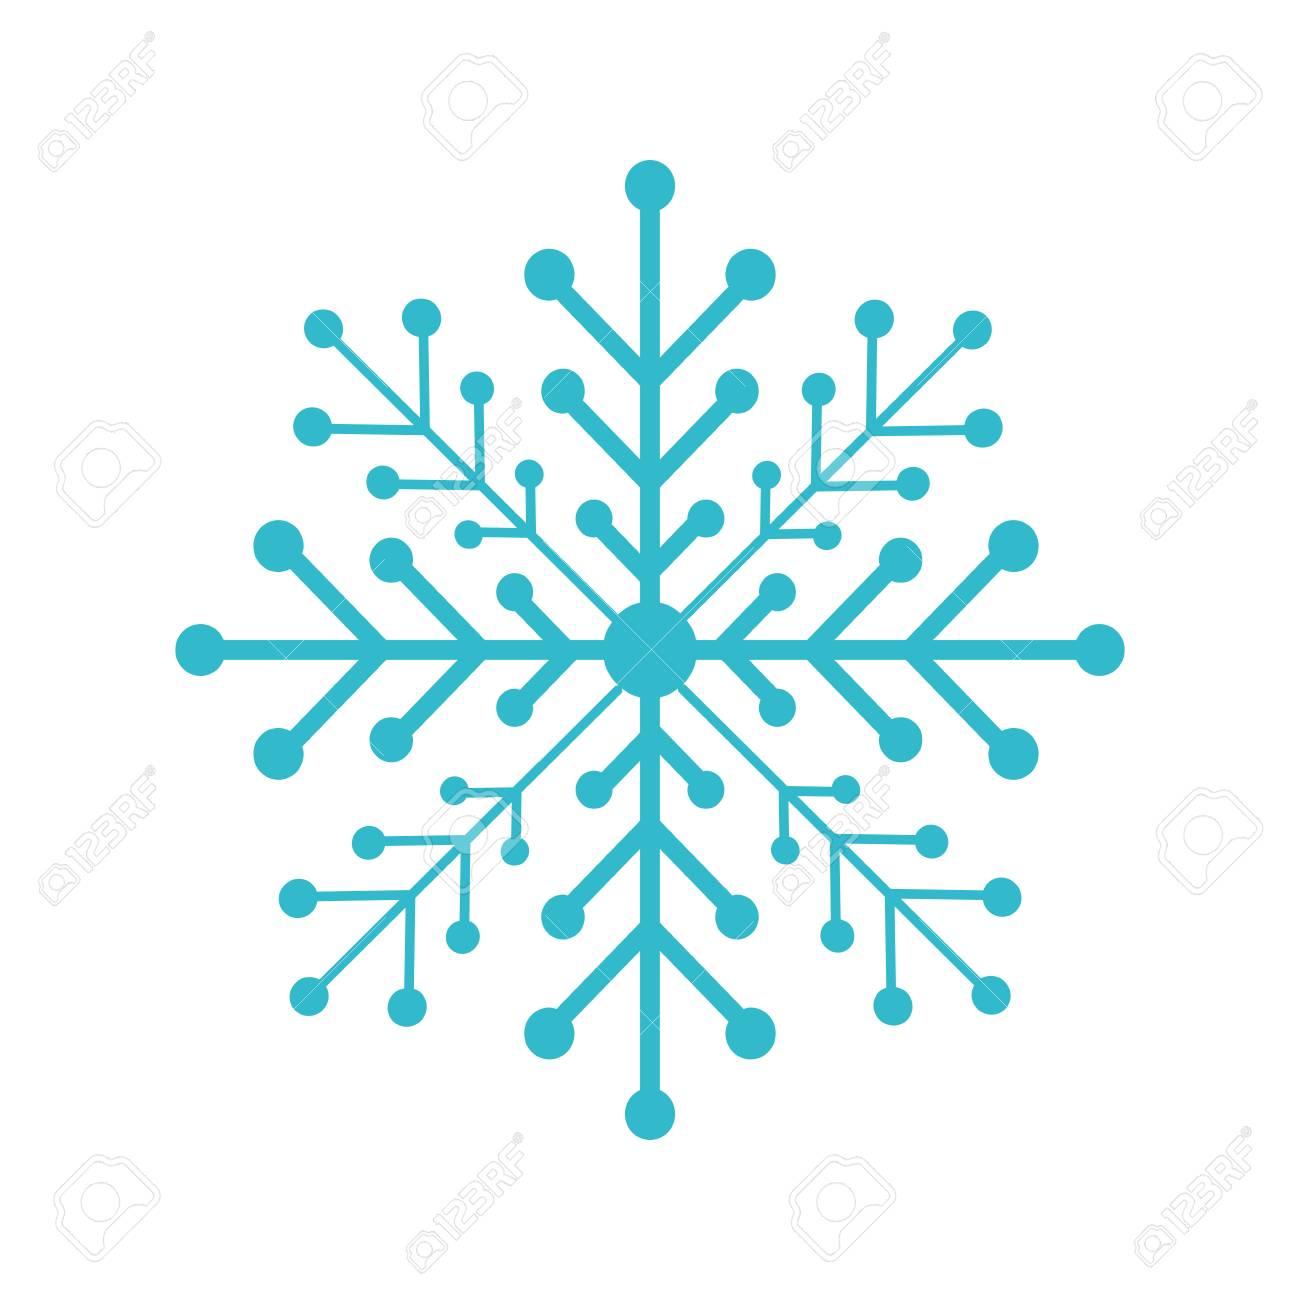 snow flake isolated icon vector illustration design - 84748734